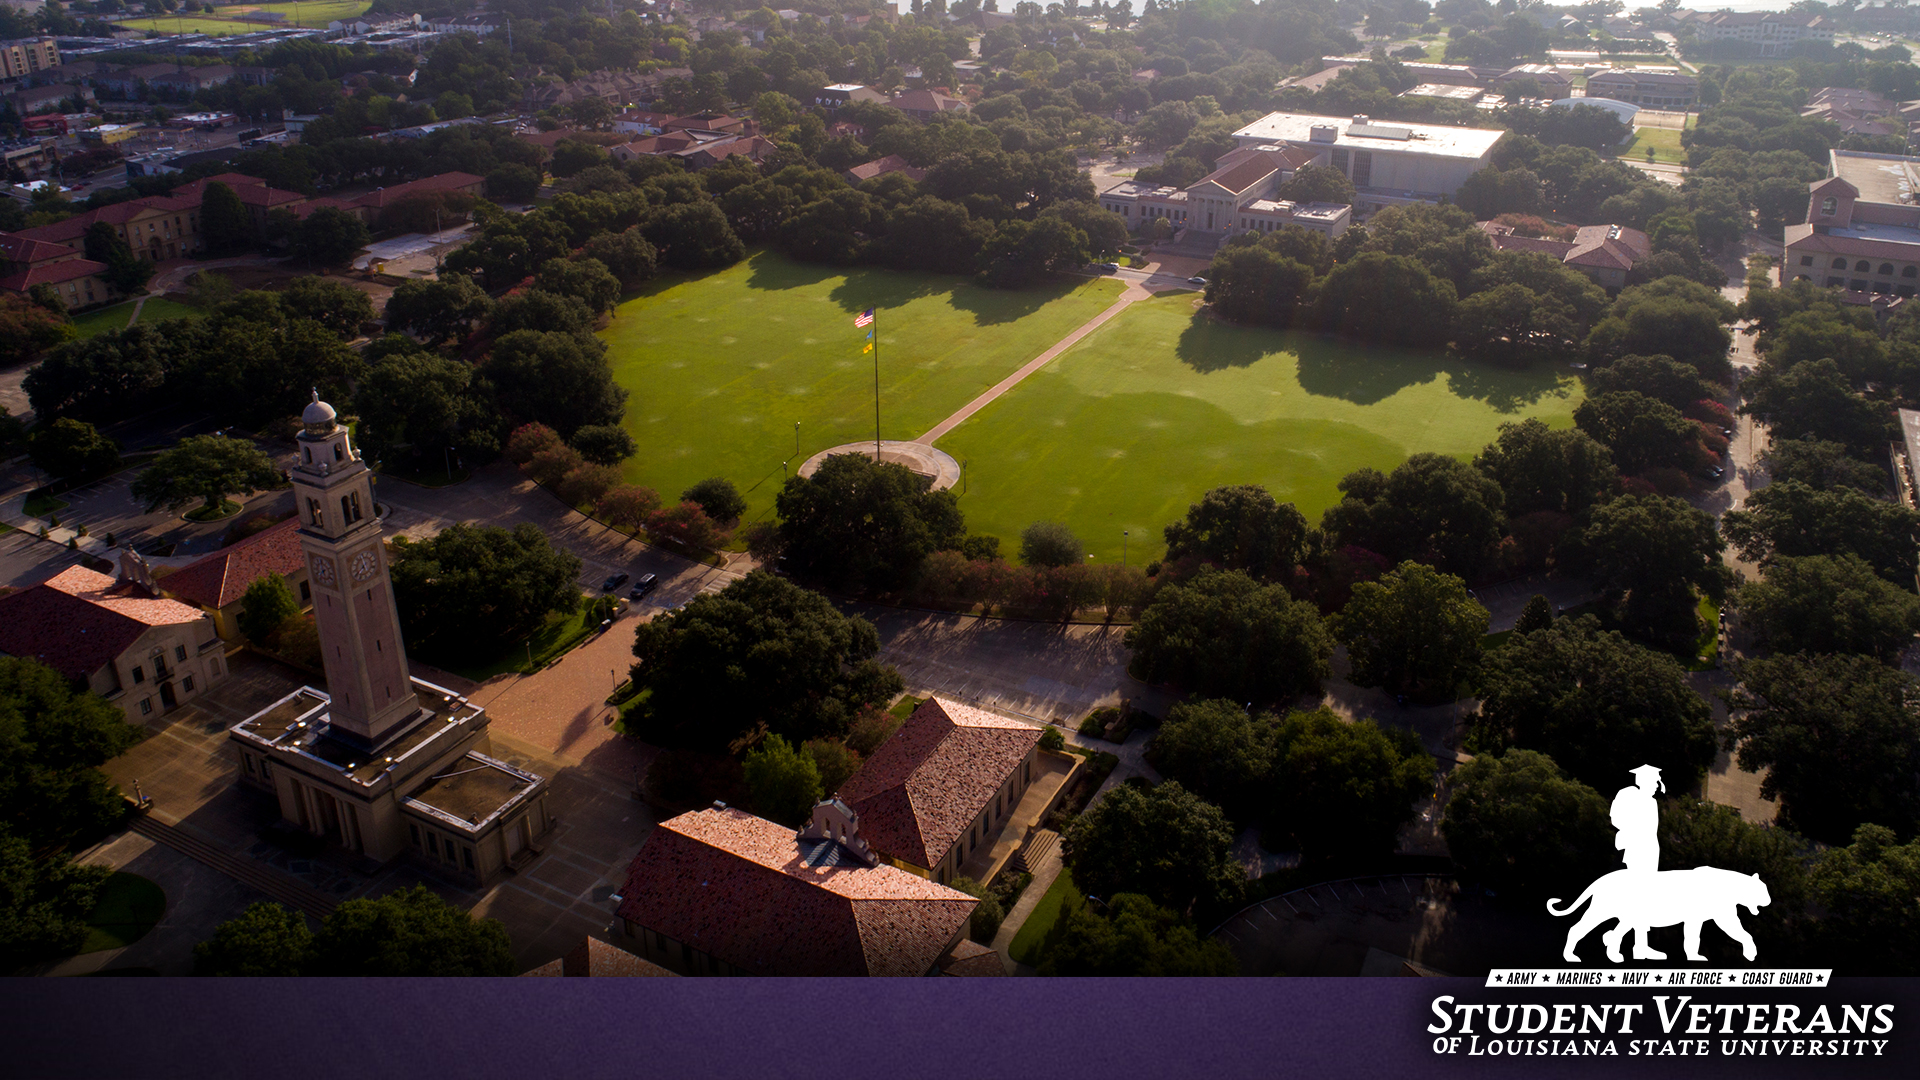 SV_LOGO_DroneShot1.jpg